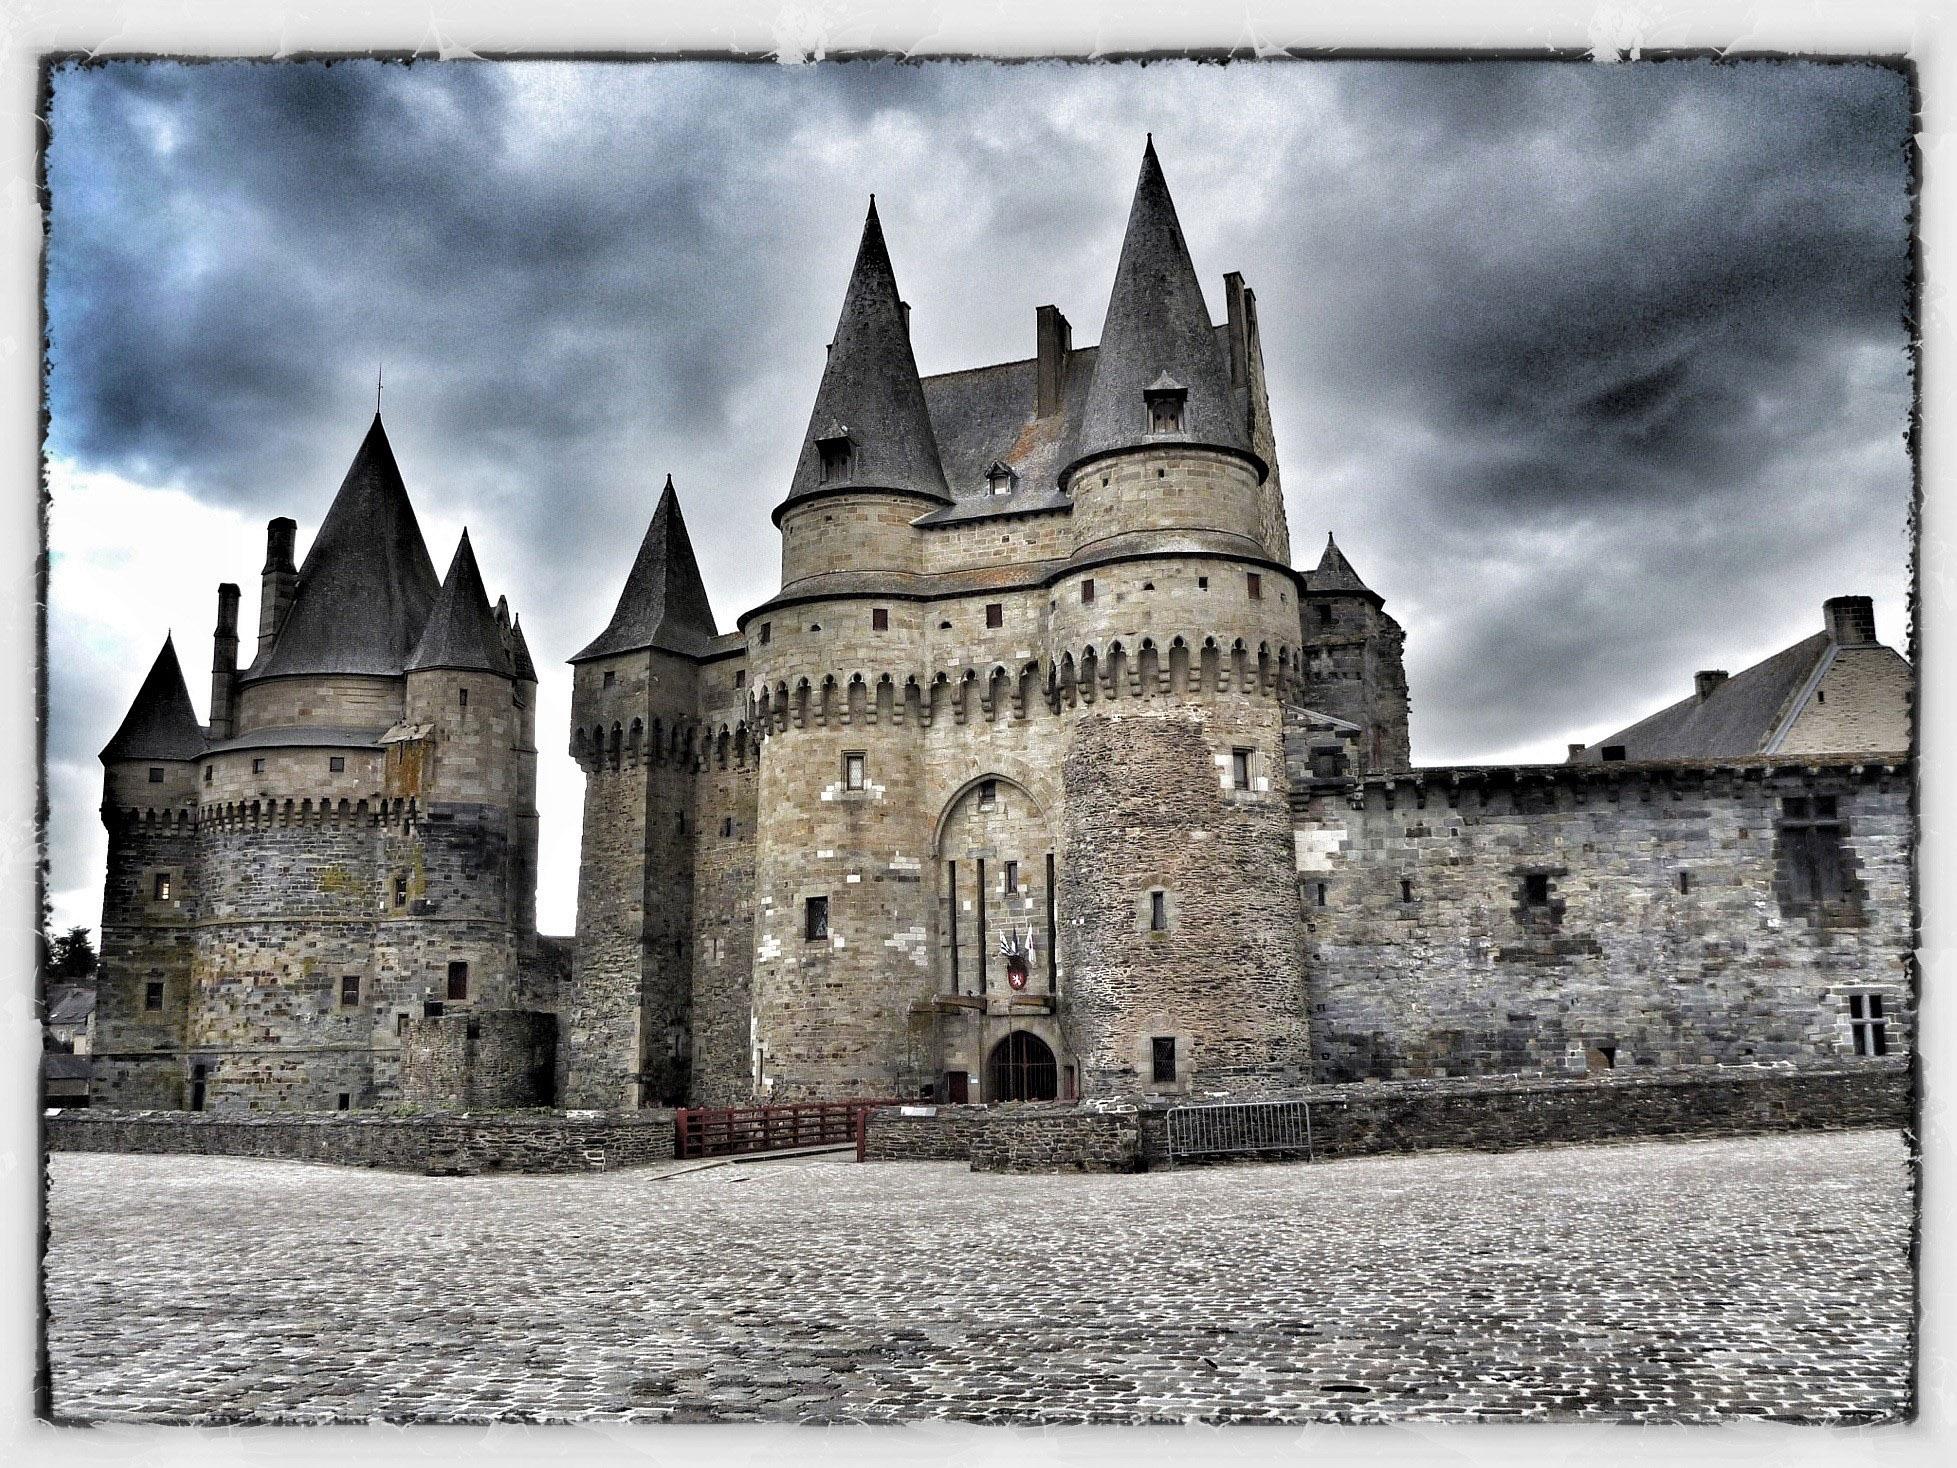 Zamek w Vitre